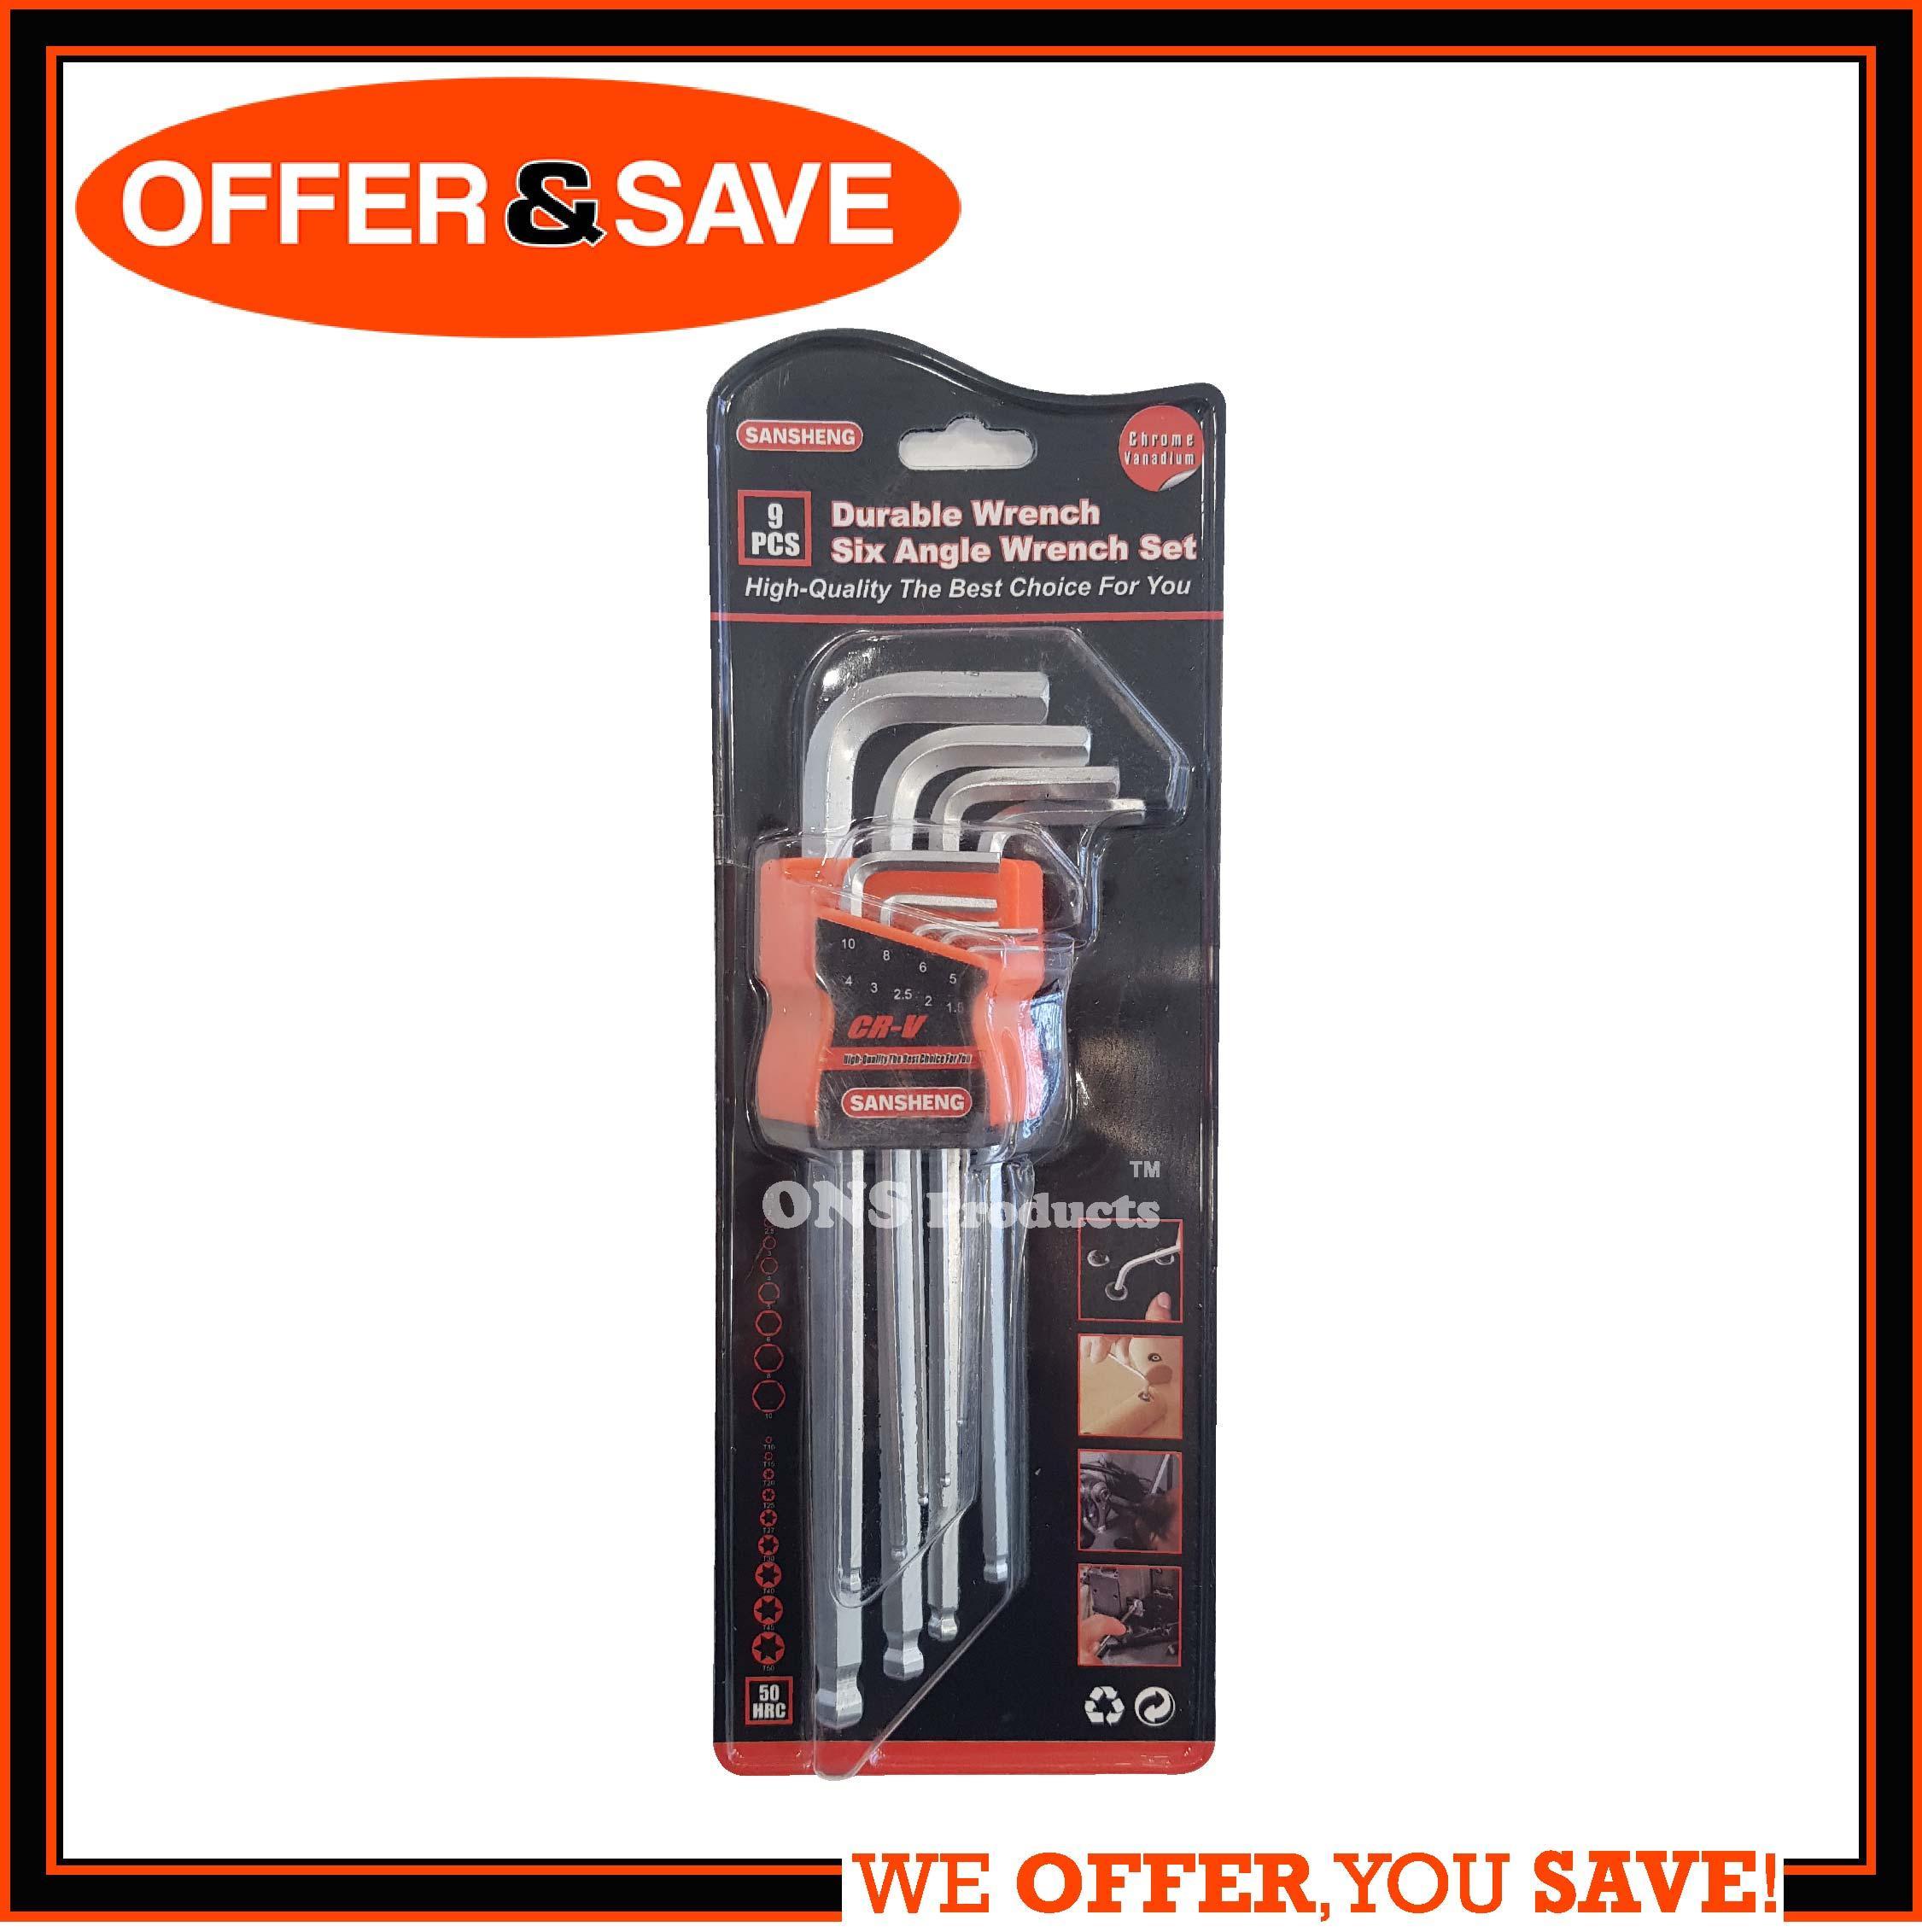 ONS 9pcs Cr-V Hex Key Set / Ball Point Allen Key / Wrench Set / Long Arm- SDY94084